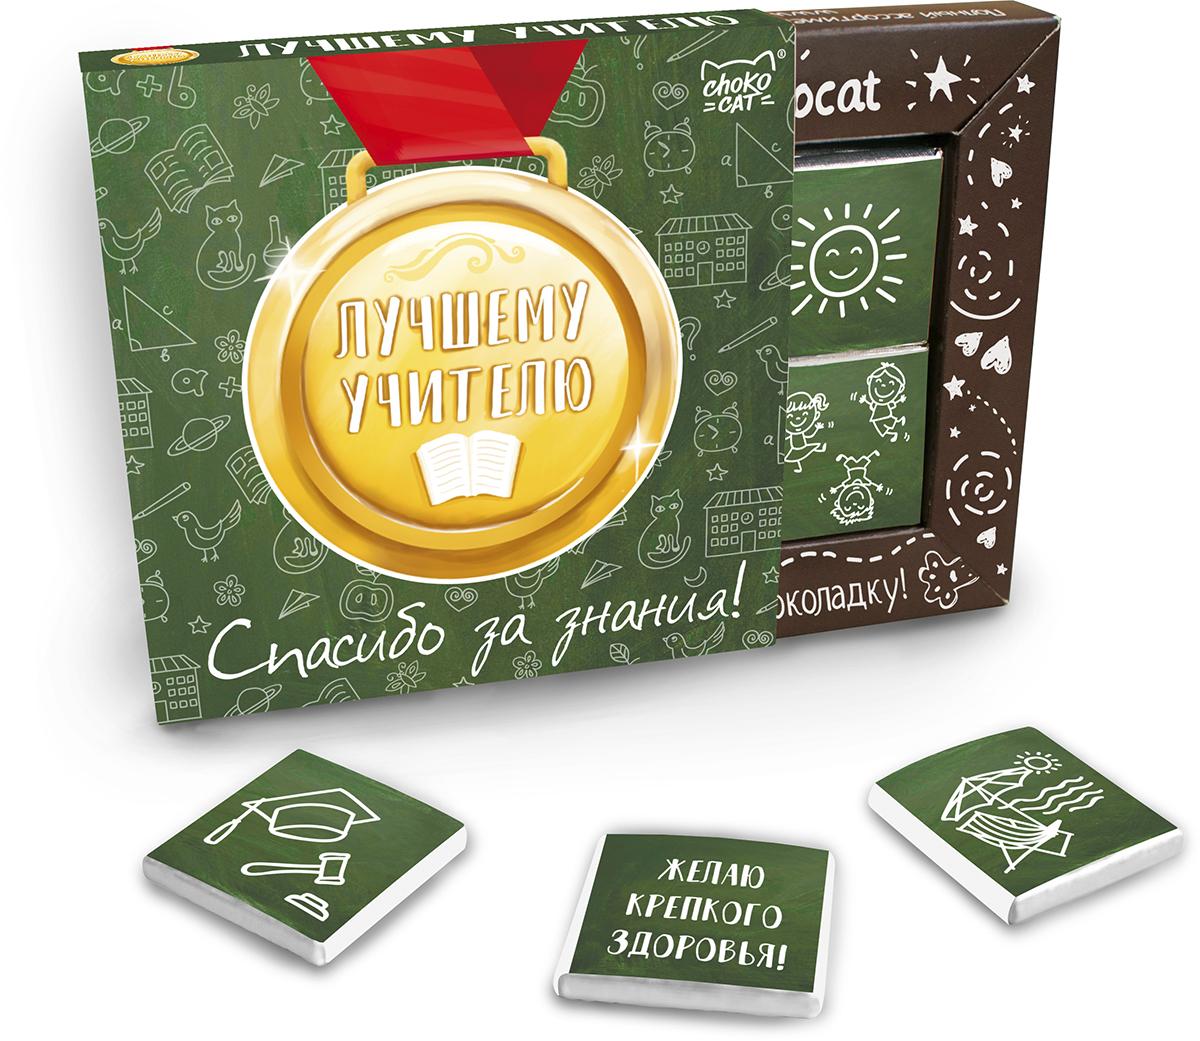 Chokocat Лучшему учителю молочный шоколад, 60 г chokocat лучшему учителю лучшие ученики молочный шоколад 60 г